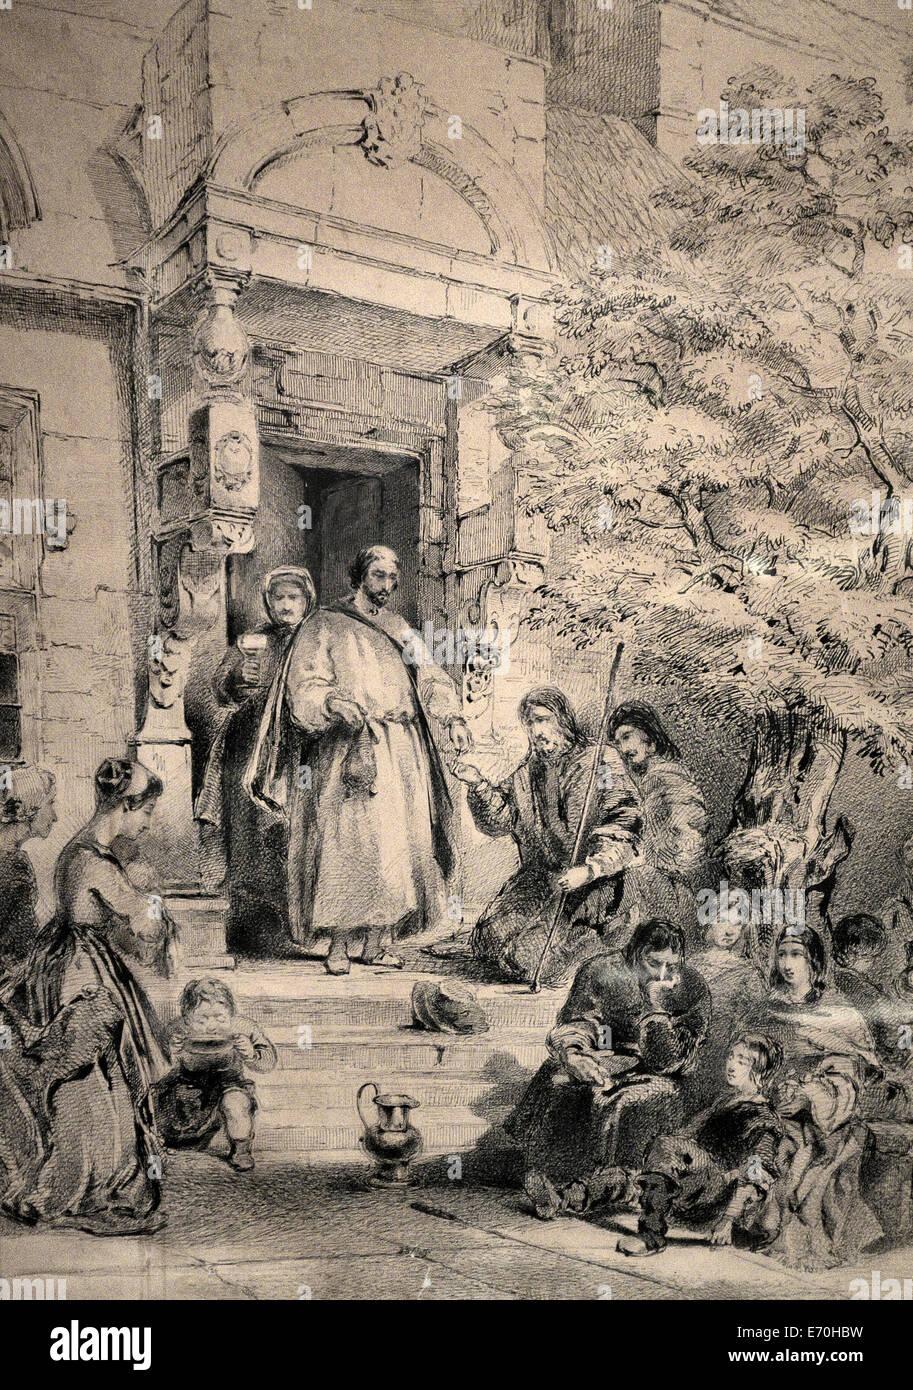 Man dispensing alms - James Whistler 1854 - Stock Image